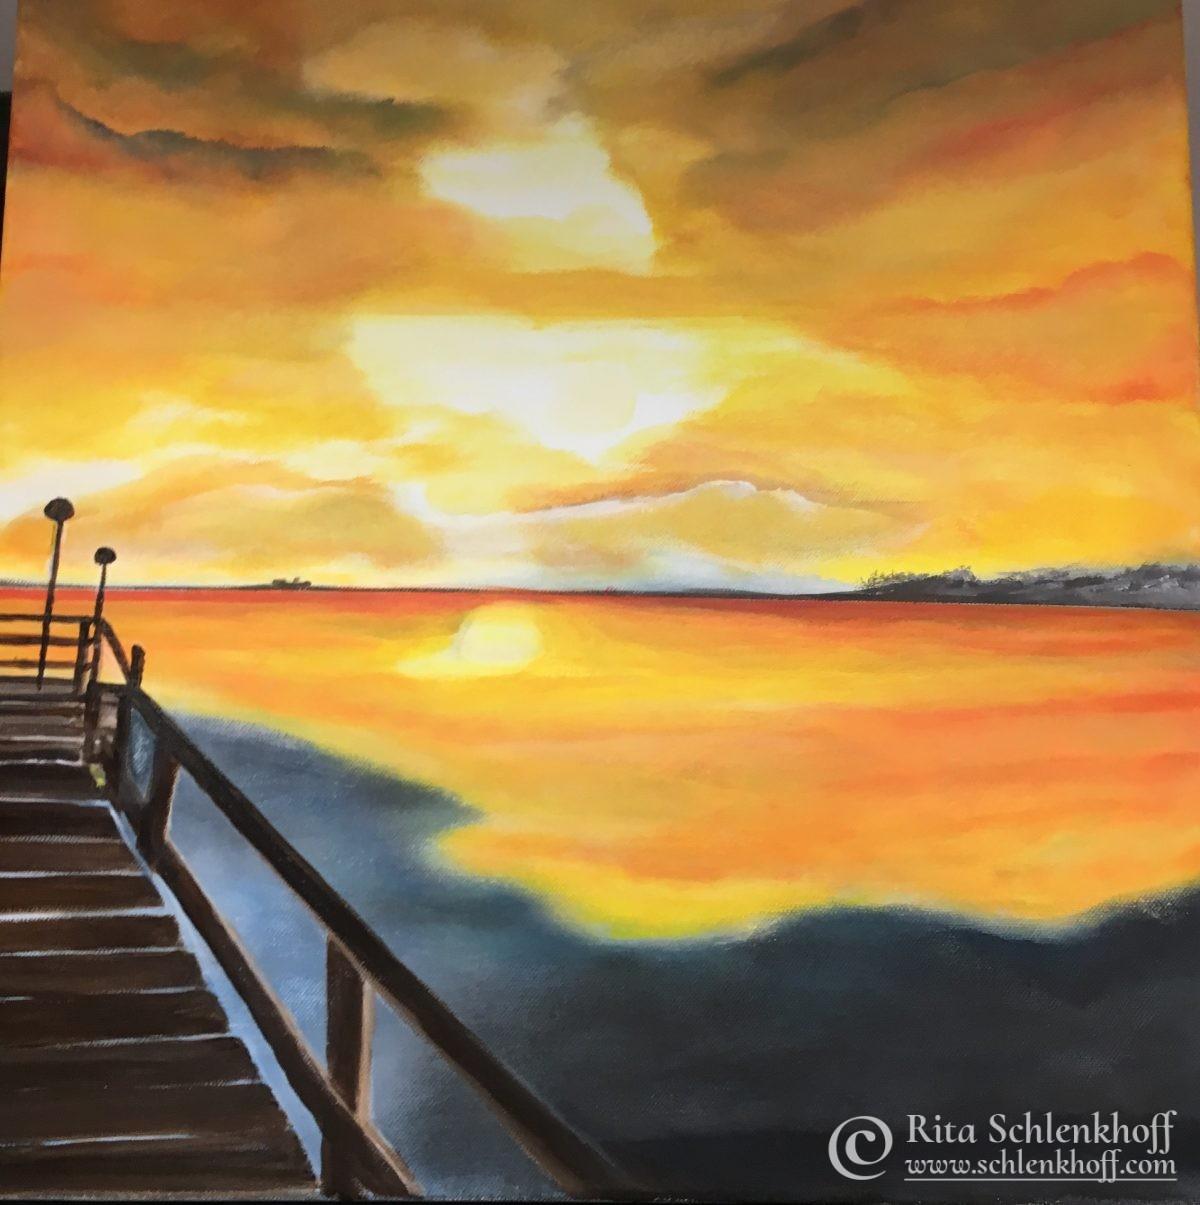 Acryl auf Leinwand 50 x 50 cm Sonnenuntergang Seebrücke Pelzerhaken